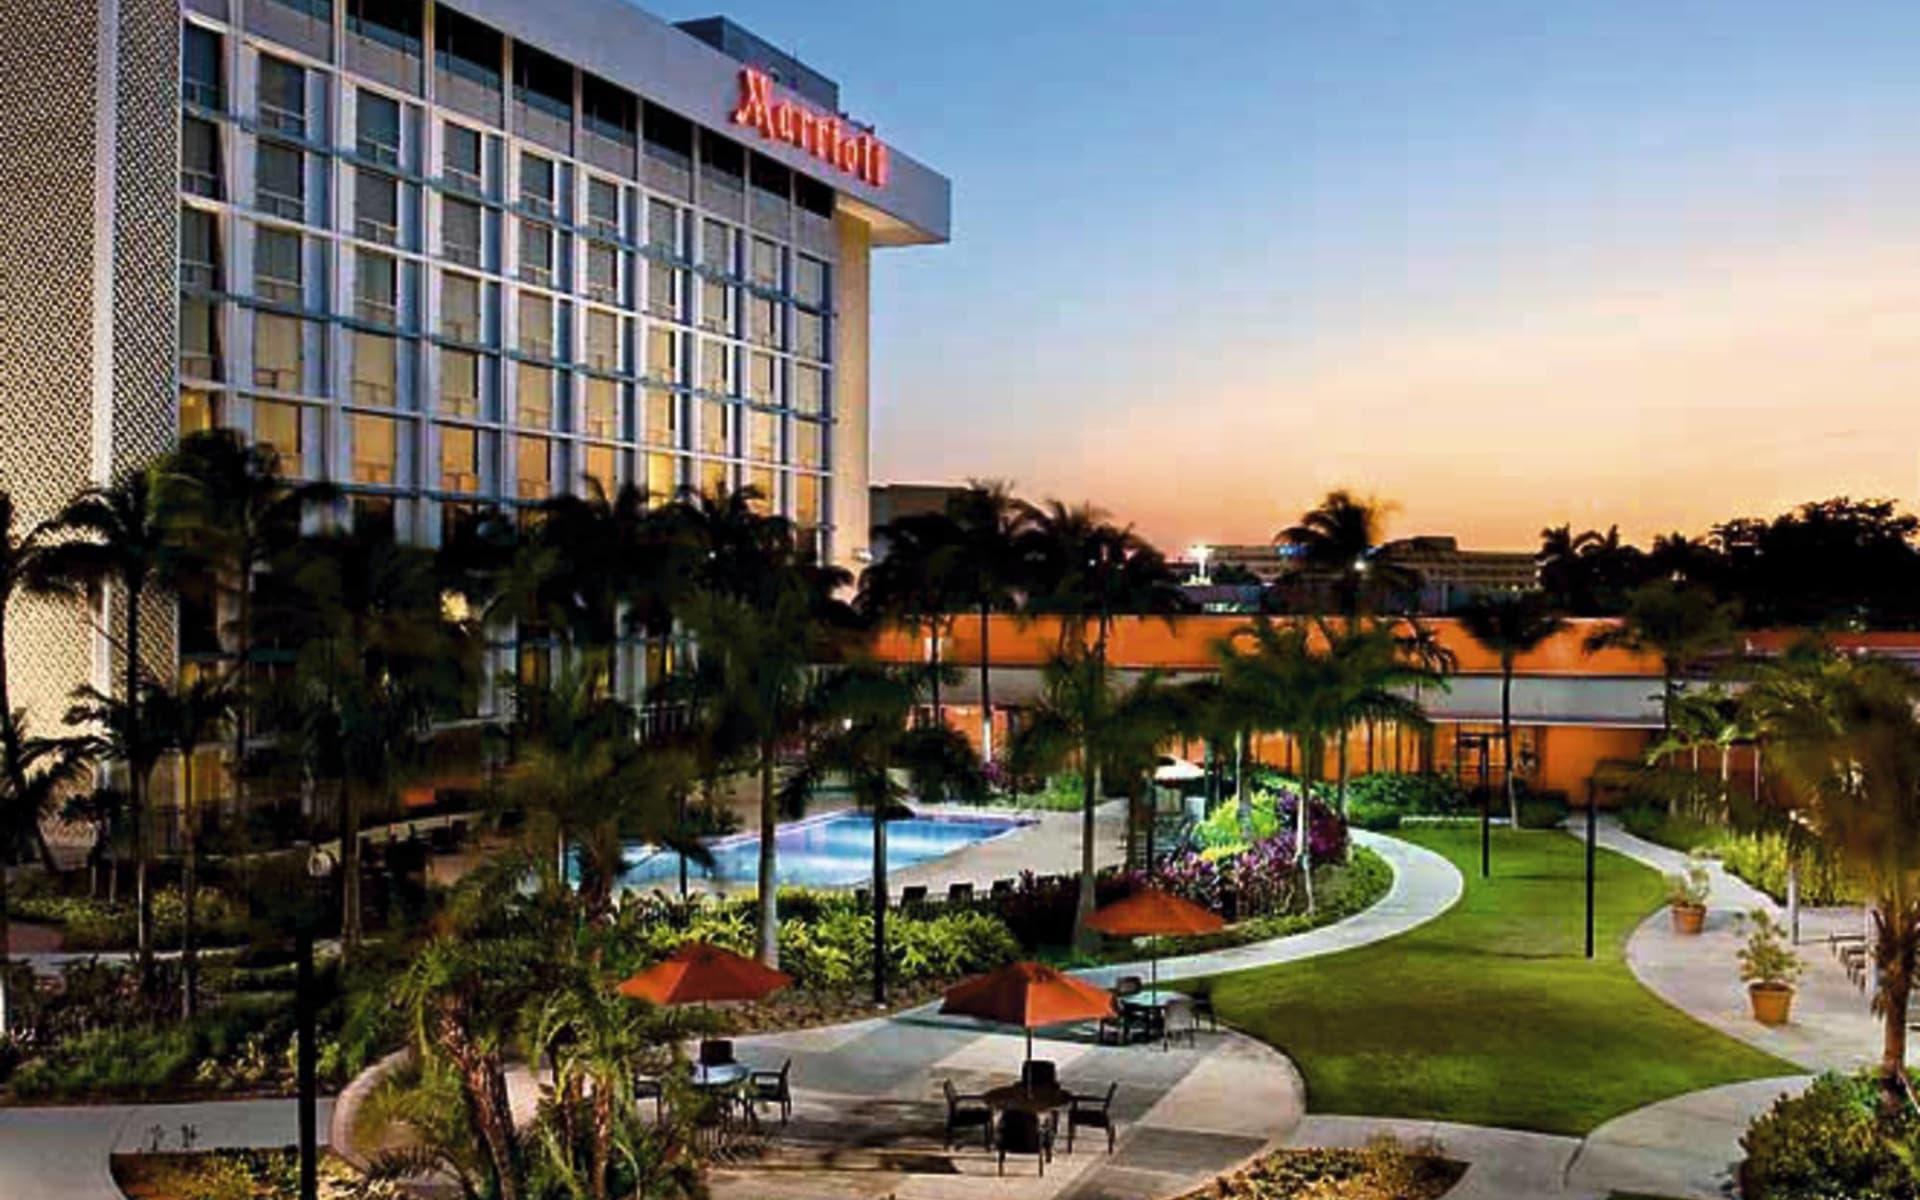 Los Angeles Airport Marriott:  Mariott LAX Airport - Gartenanlage